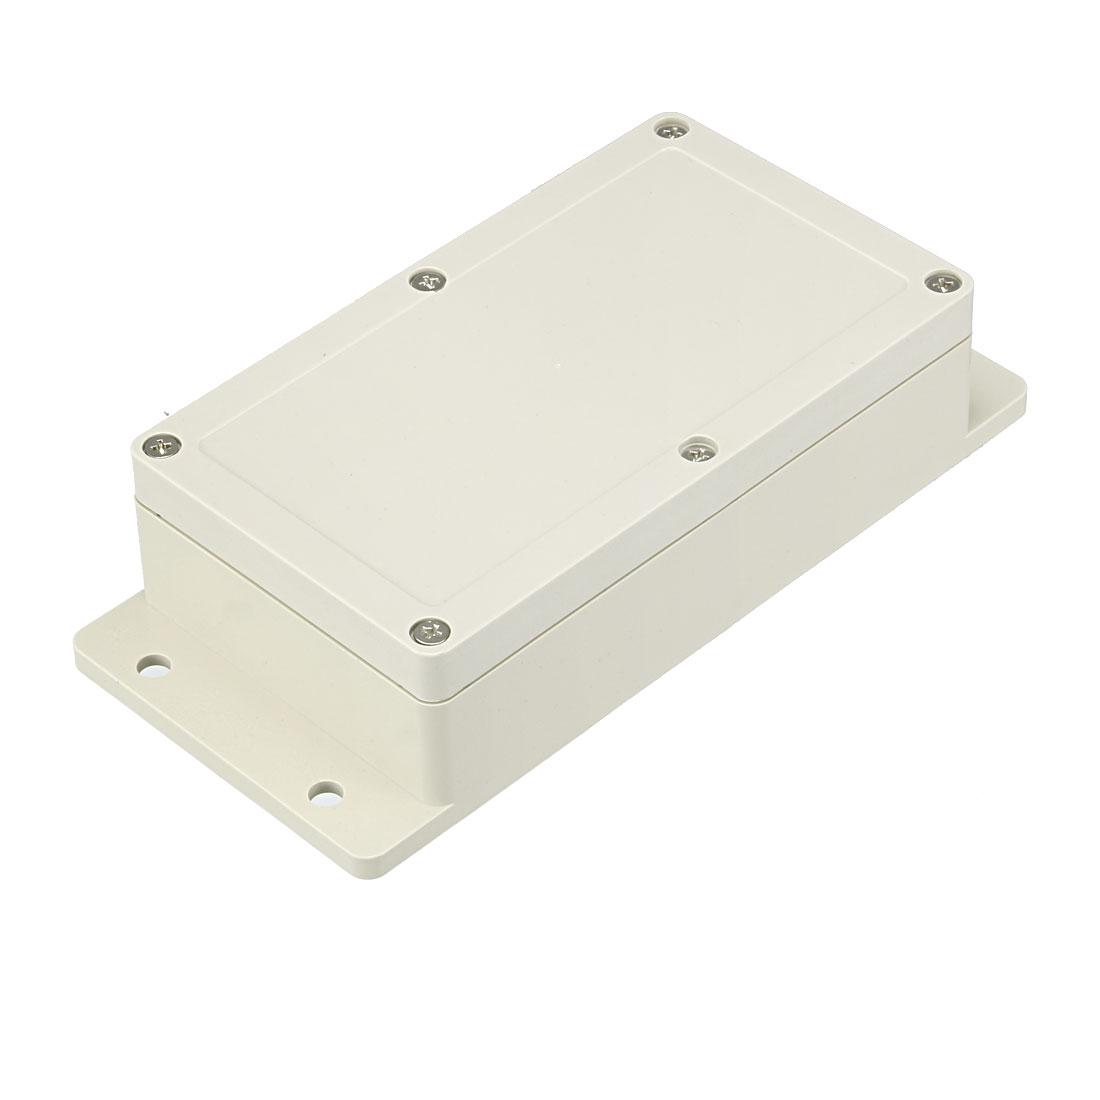 158 x 90 x 46mm Electronic ABS Plastic DIY Junction Box Enclosure Case Grey